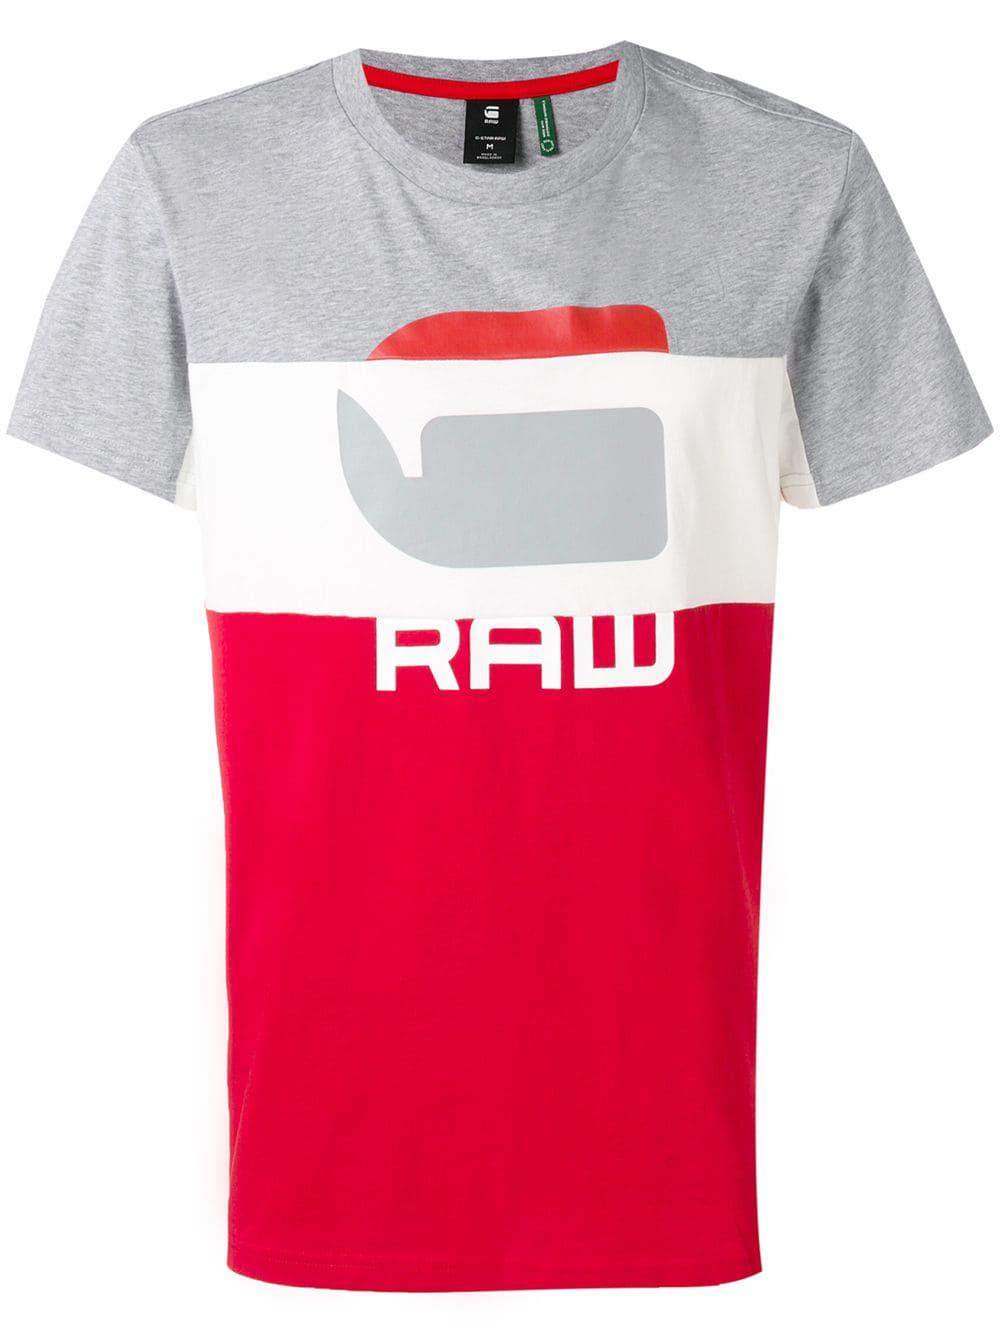 05e04e4a72e G-Star Raw Research Logo Print T-Shirt - Red